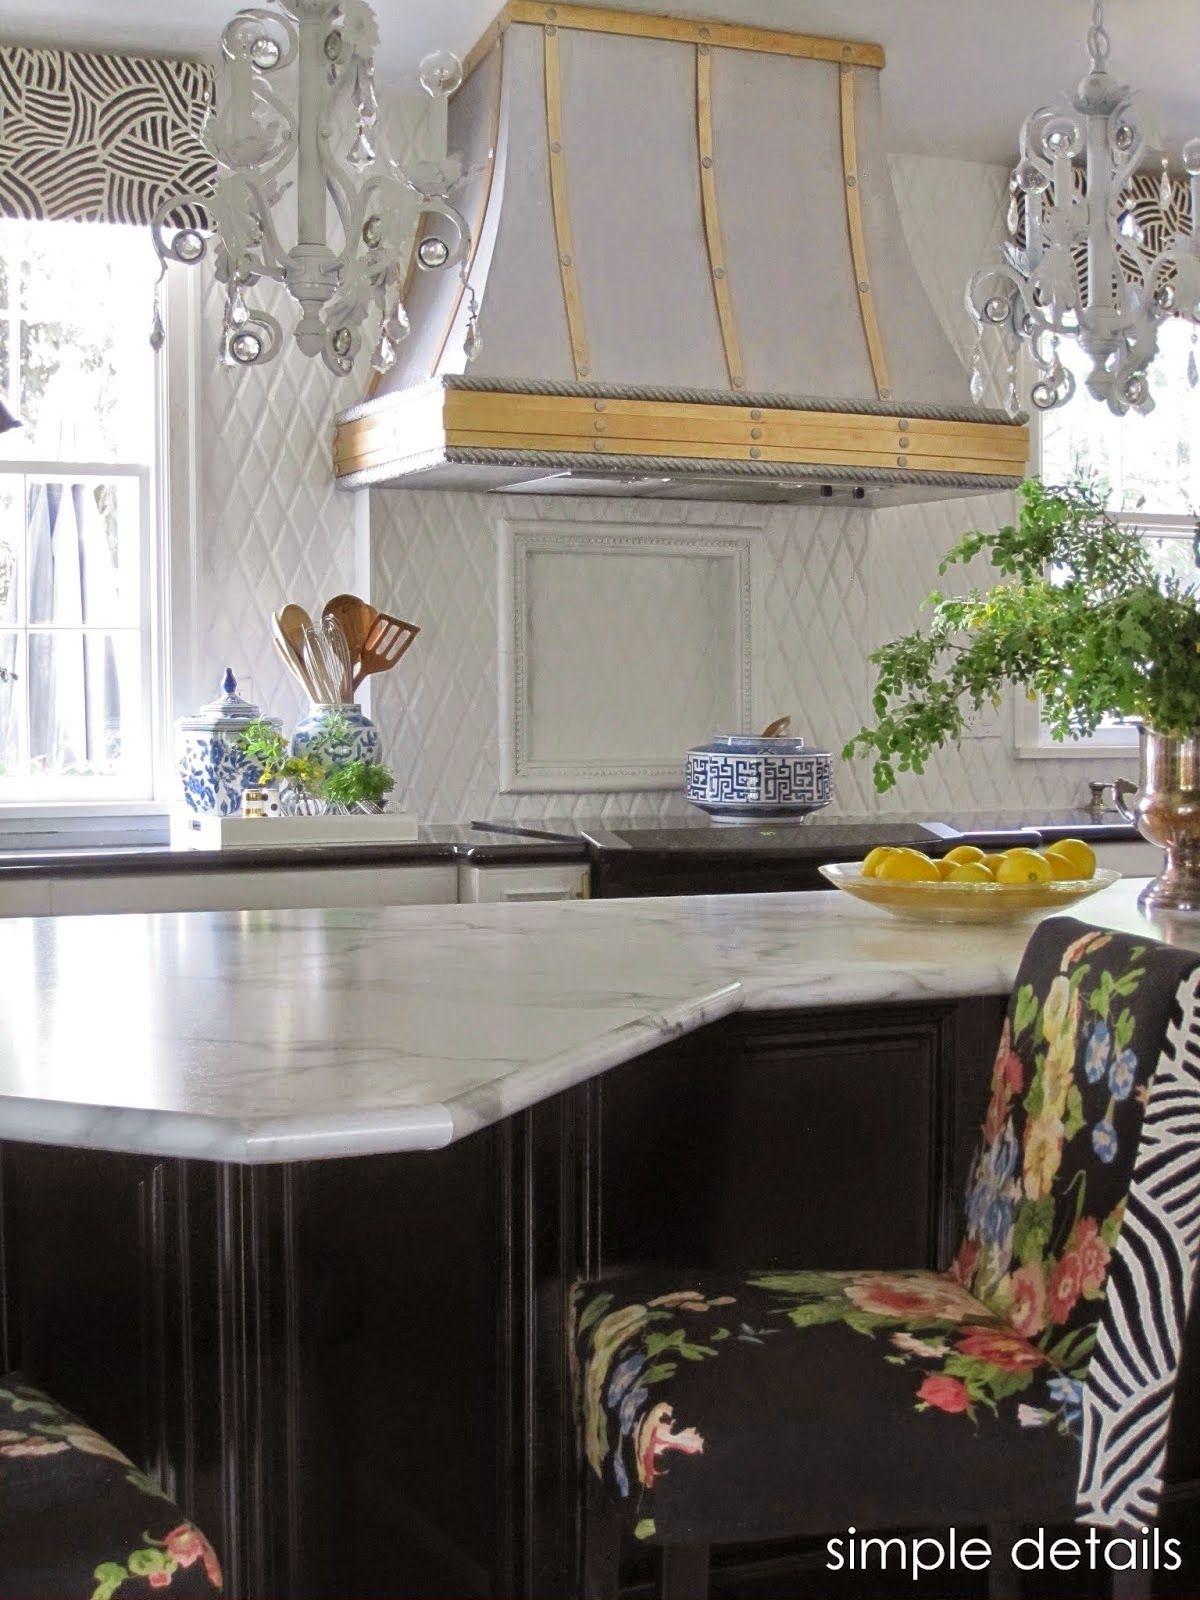 Best Kitchen Gallery: Amazing Diy Hood Simple Details Diy Metal Range Hood Diy of Tuscan Style Kitchen Hoods on rachelxblog.com